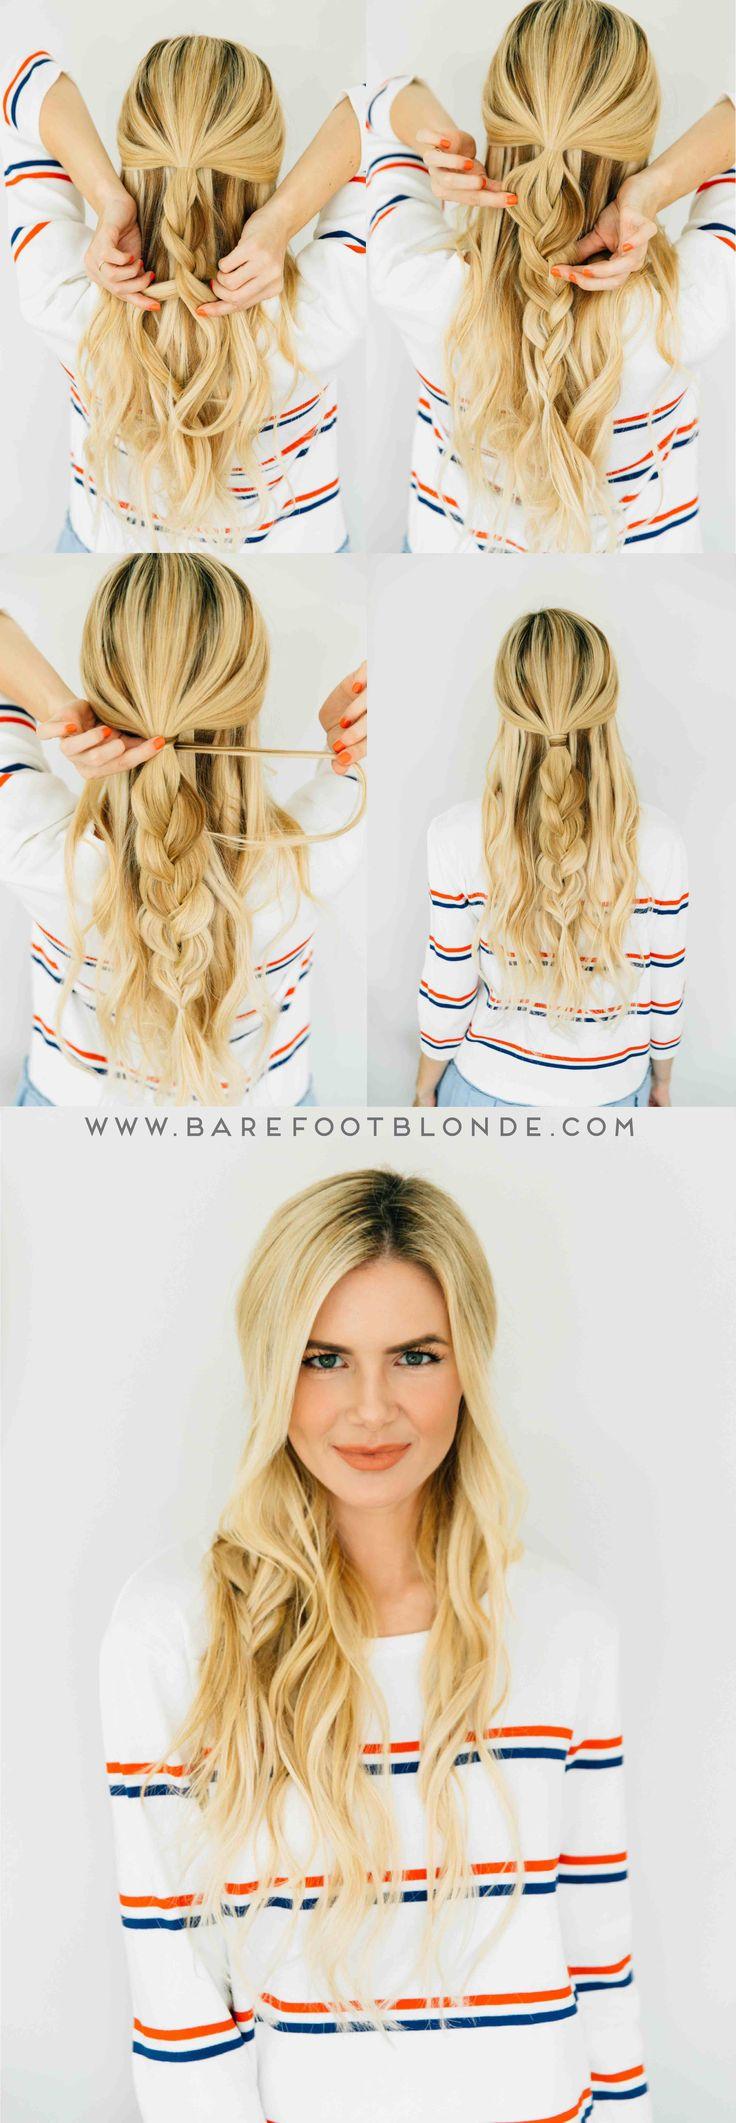 best peinados images on pinterest hair ideas cute hairstyles